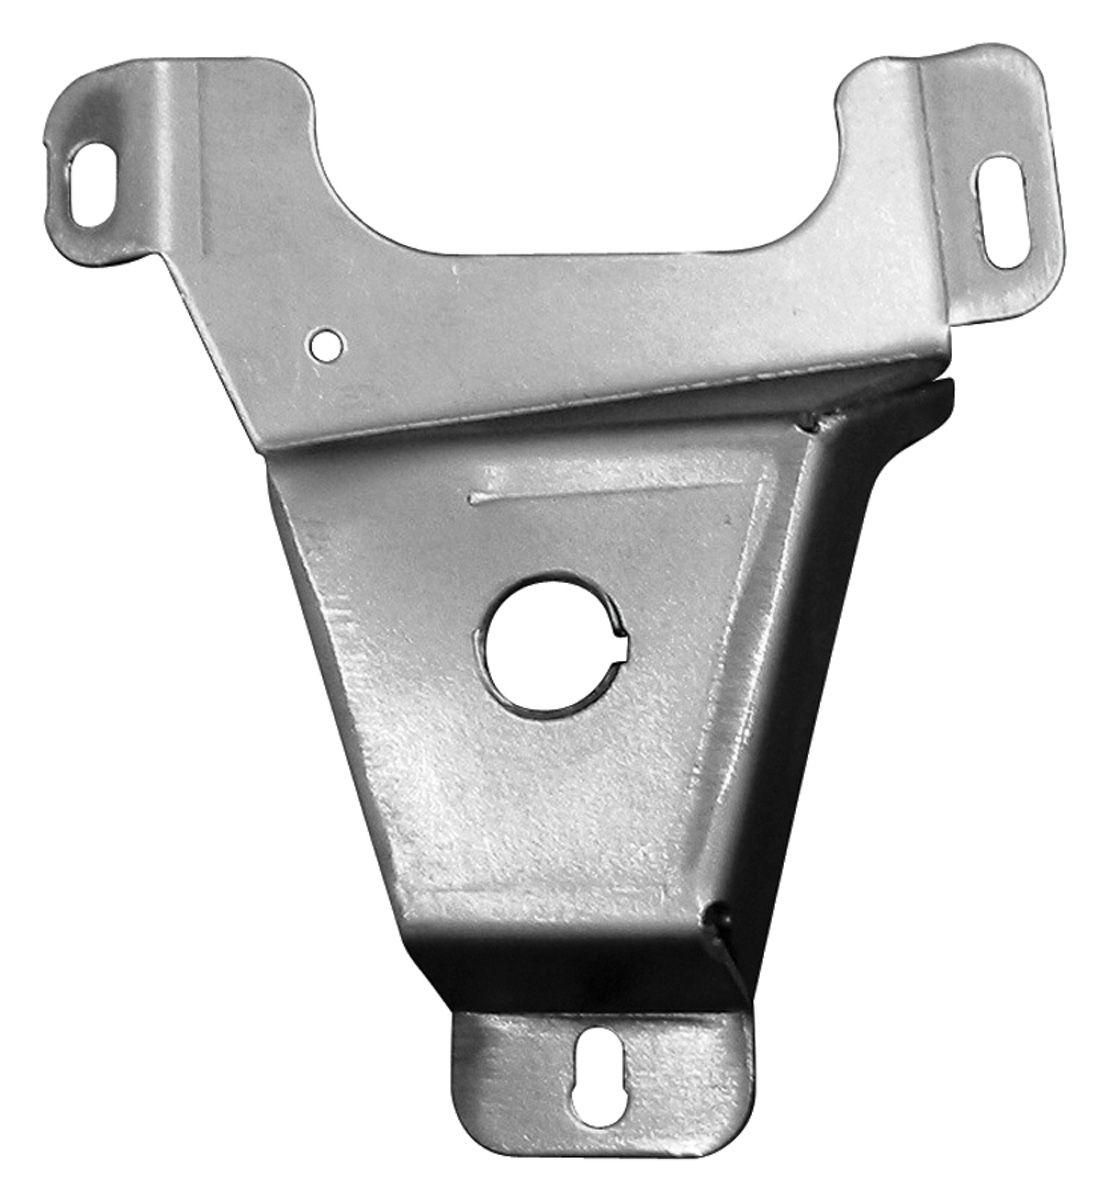 Mounting Bracket, Headlight Switch, 1986-88 El Camino/Monte Carlo